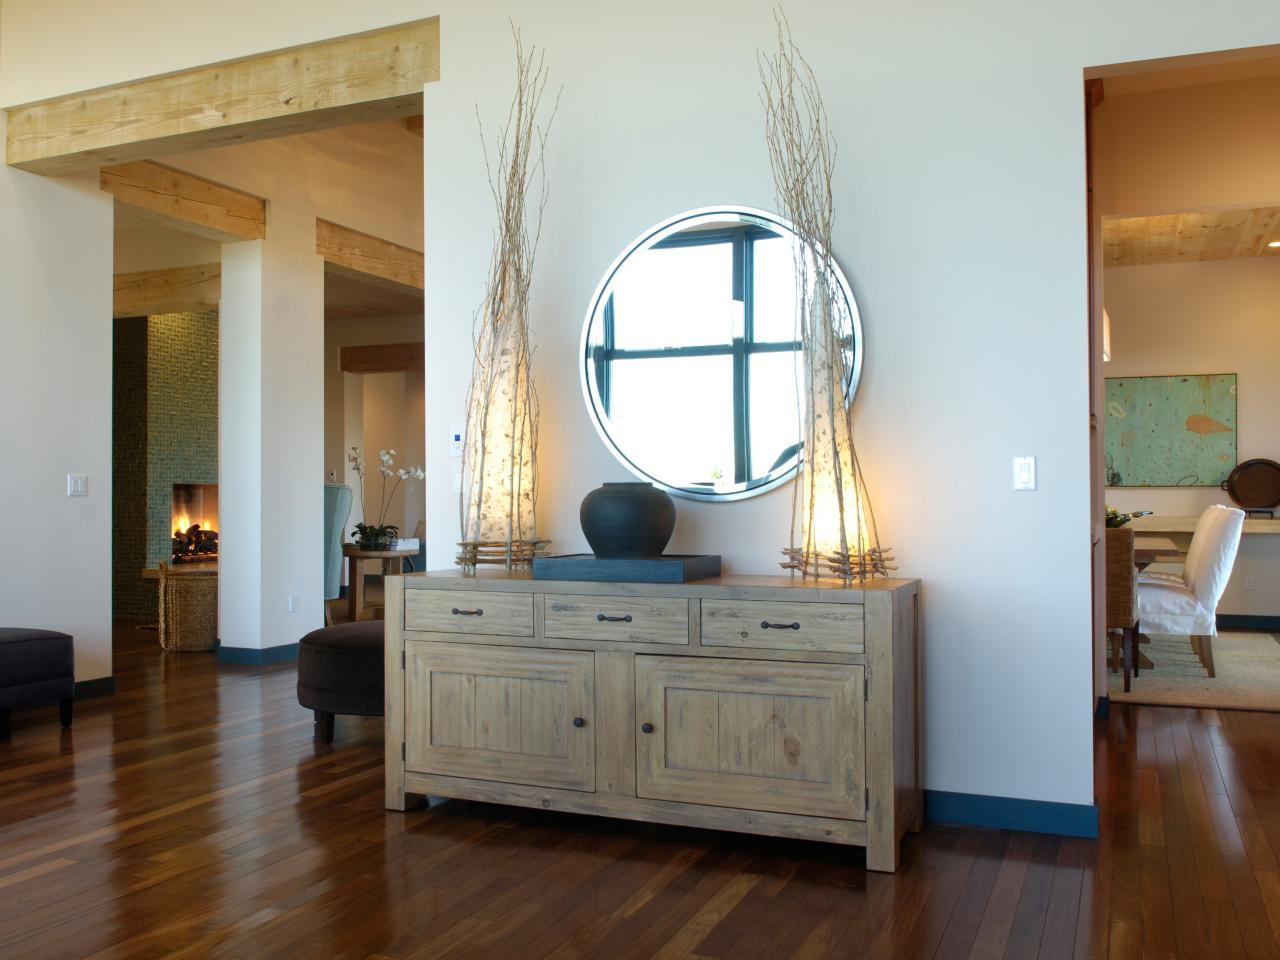 Pick Your Favorite Living Room HGTV Dream Home  Sunny DesignVineyard HutchLiving Room Hutches   Living Room Design Inspirations. Living Room Hutch. Home Design Ideas